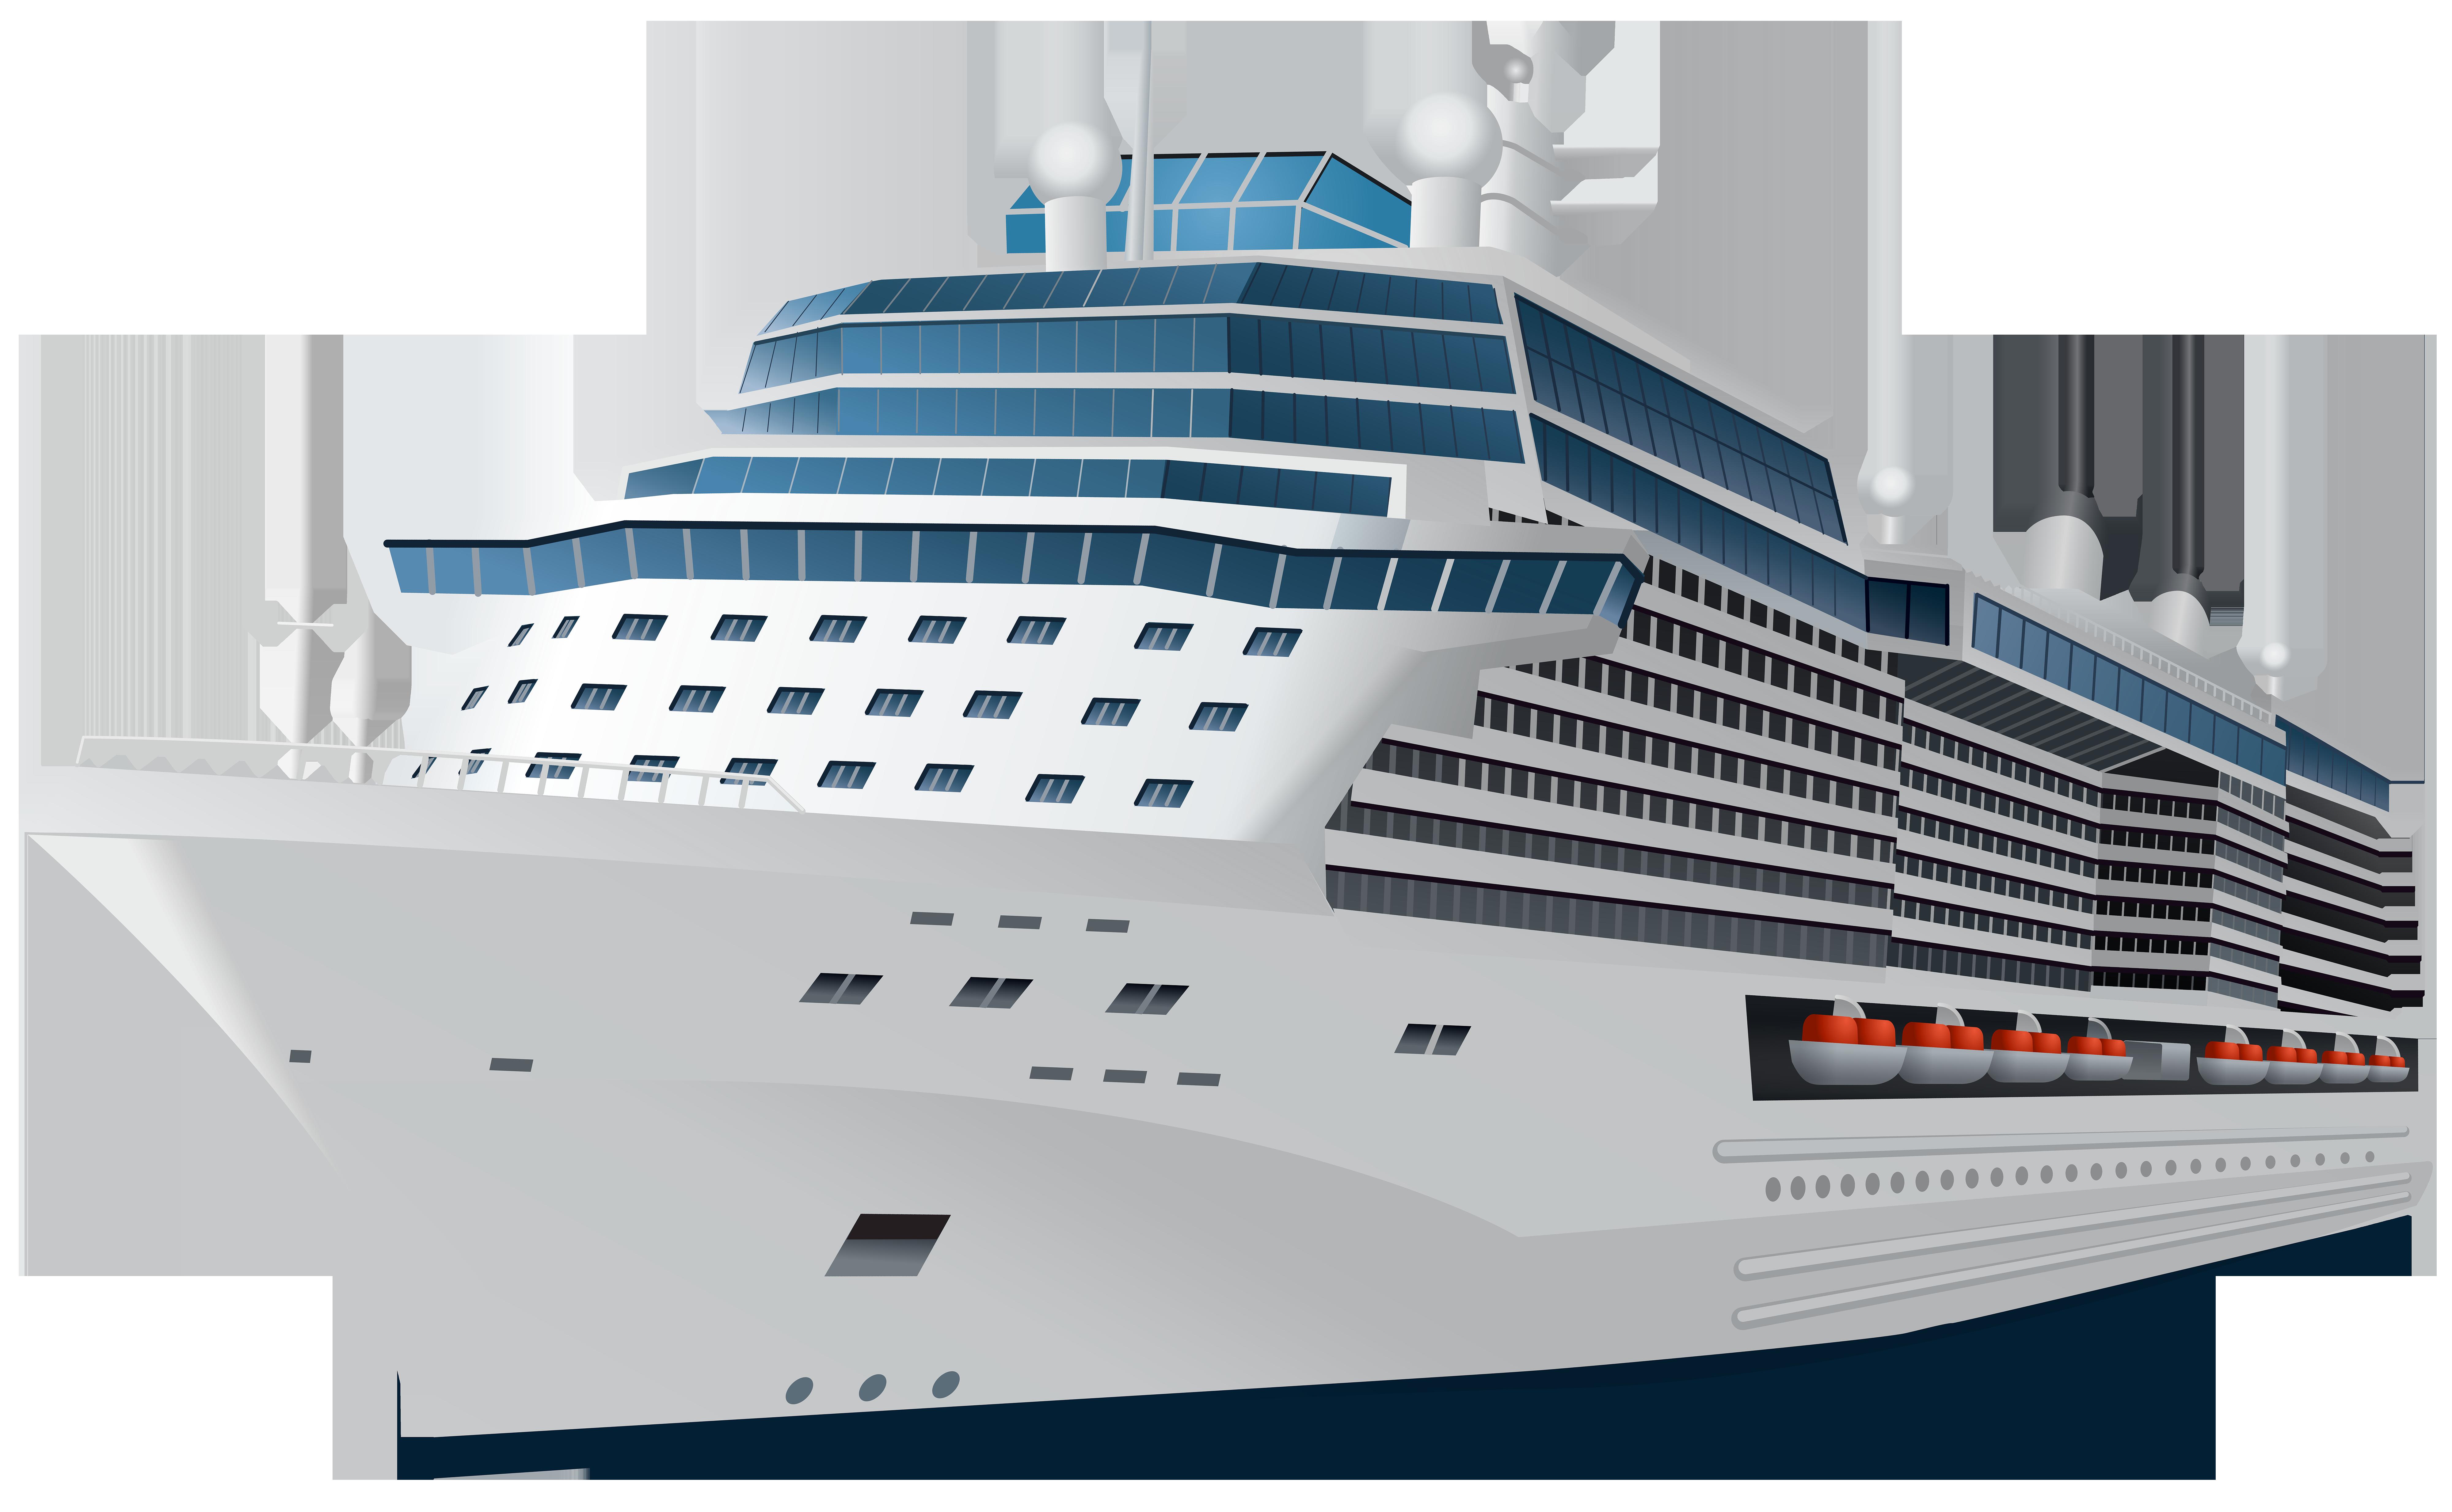 Cruise Ship Transparent PNG Clip Art Image.